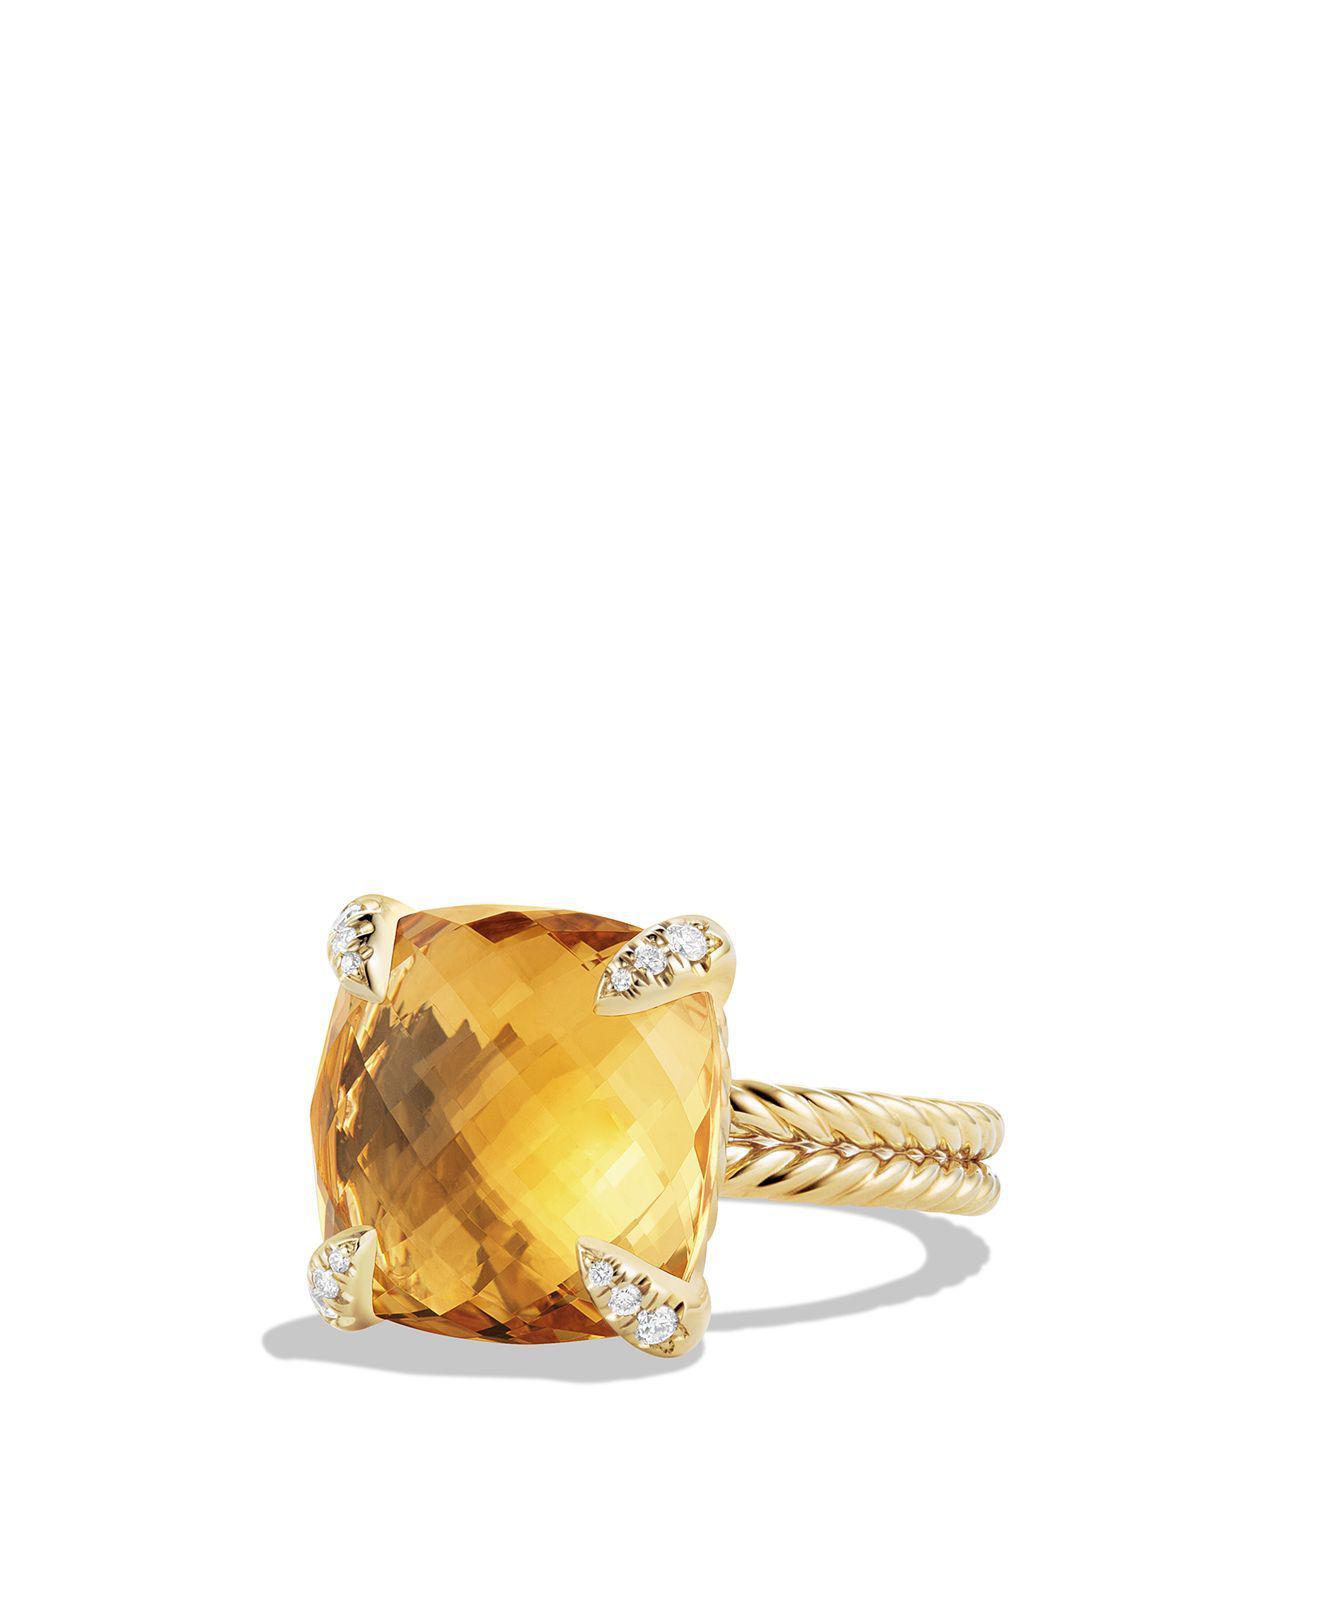 David Yurman Chatelaine Ring With Citrine And Diamonds In